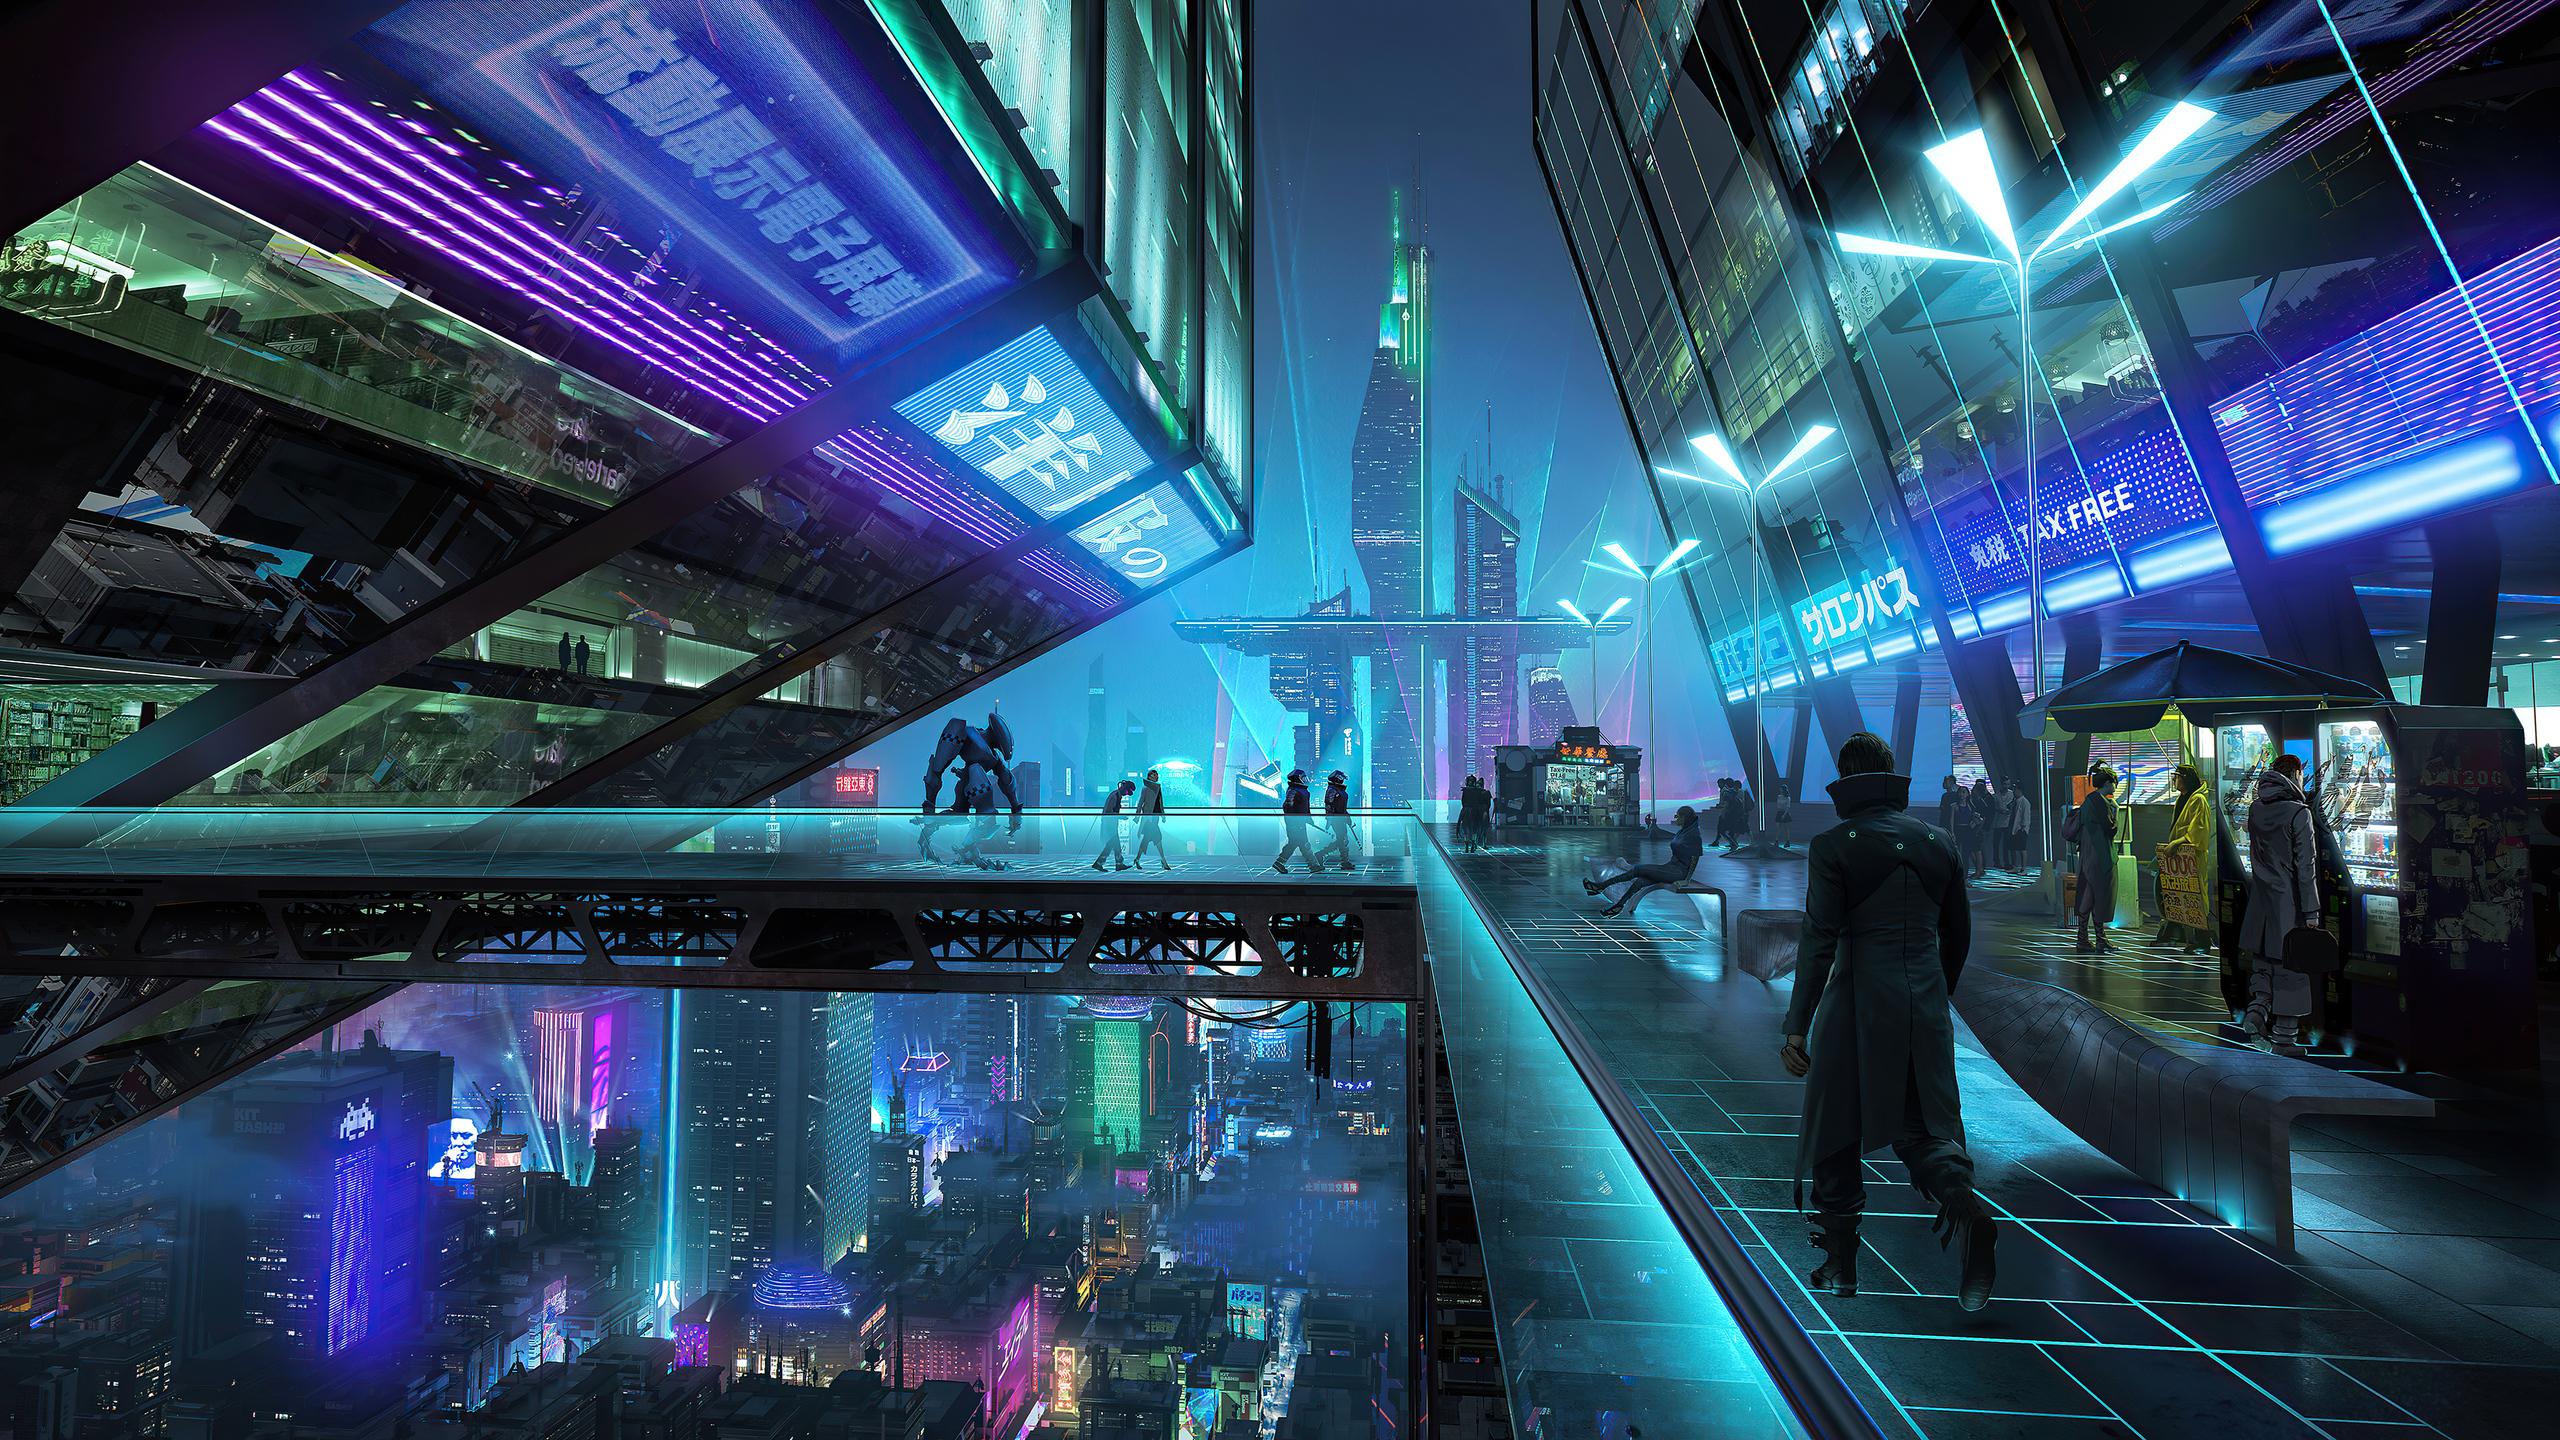 2560x1440 Neon City Night 4k 1440P Resolution HD 4k ...